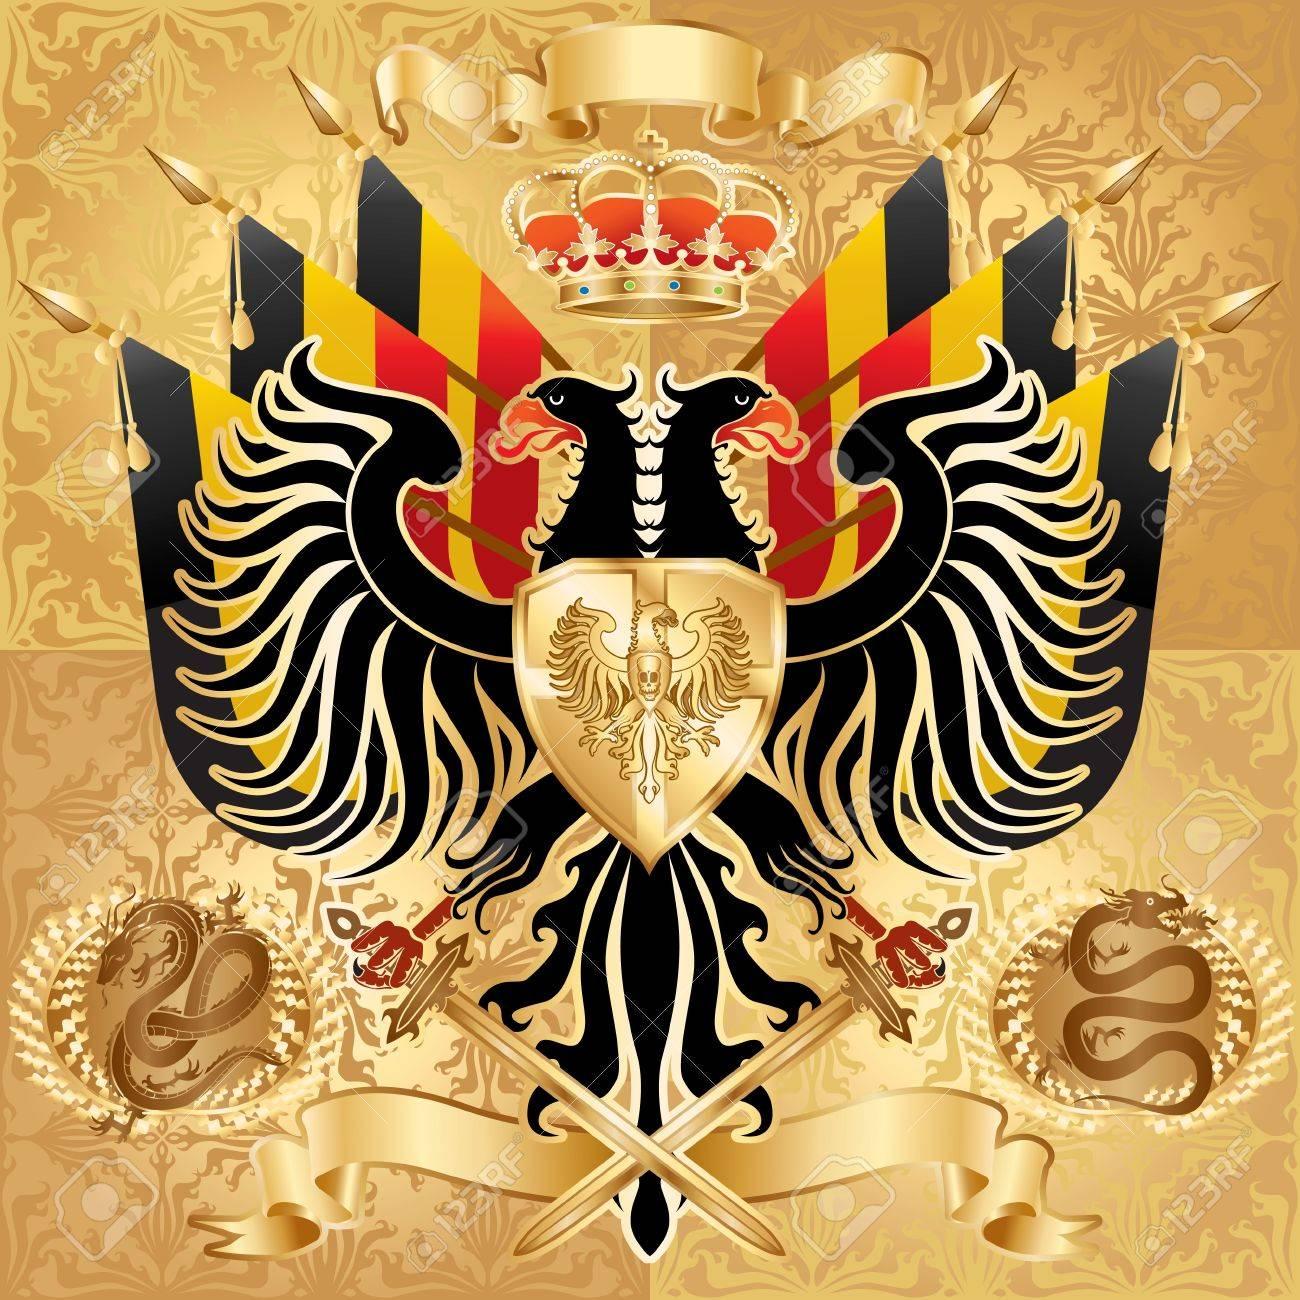 Royal Coat of Arms. illustration. Stock Illustration - 6998243